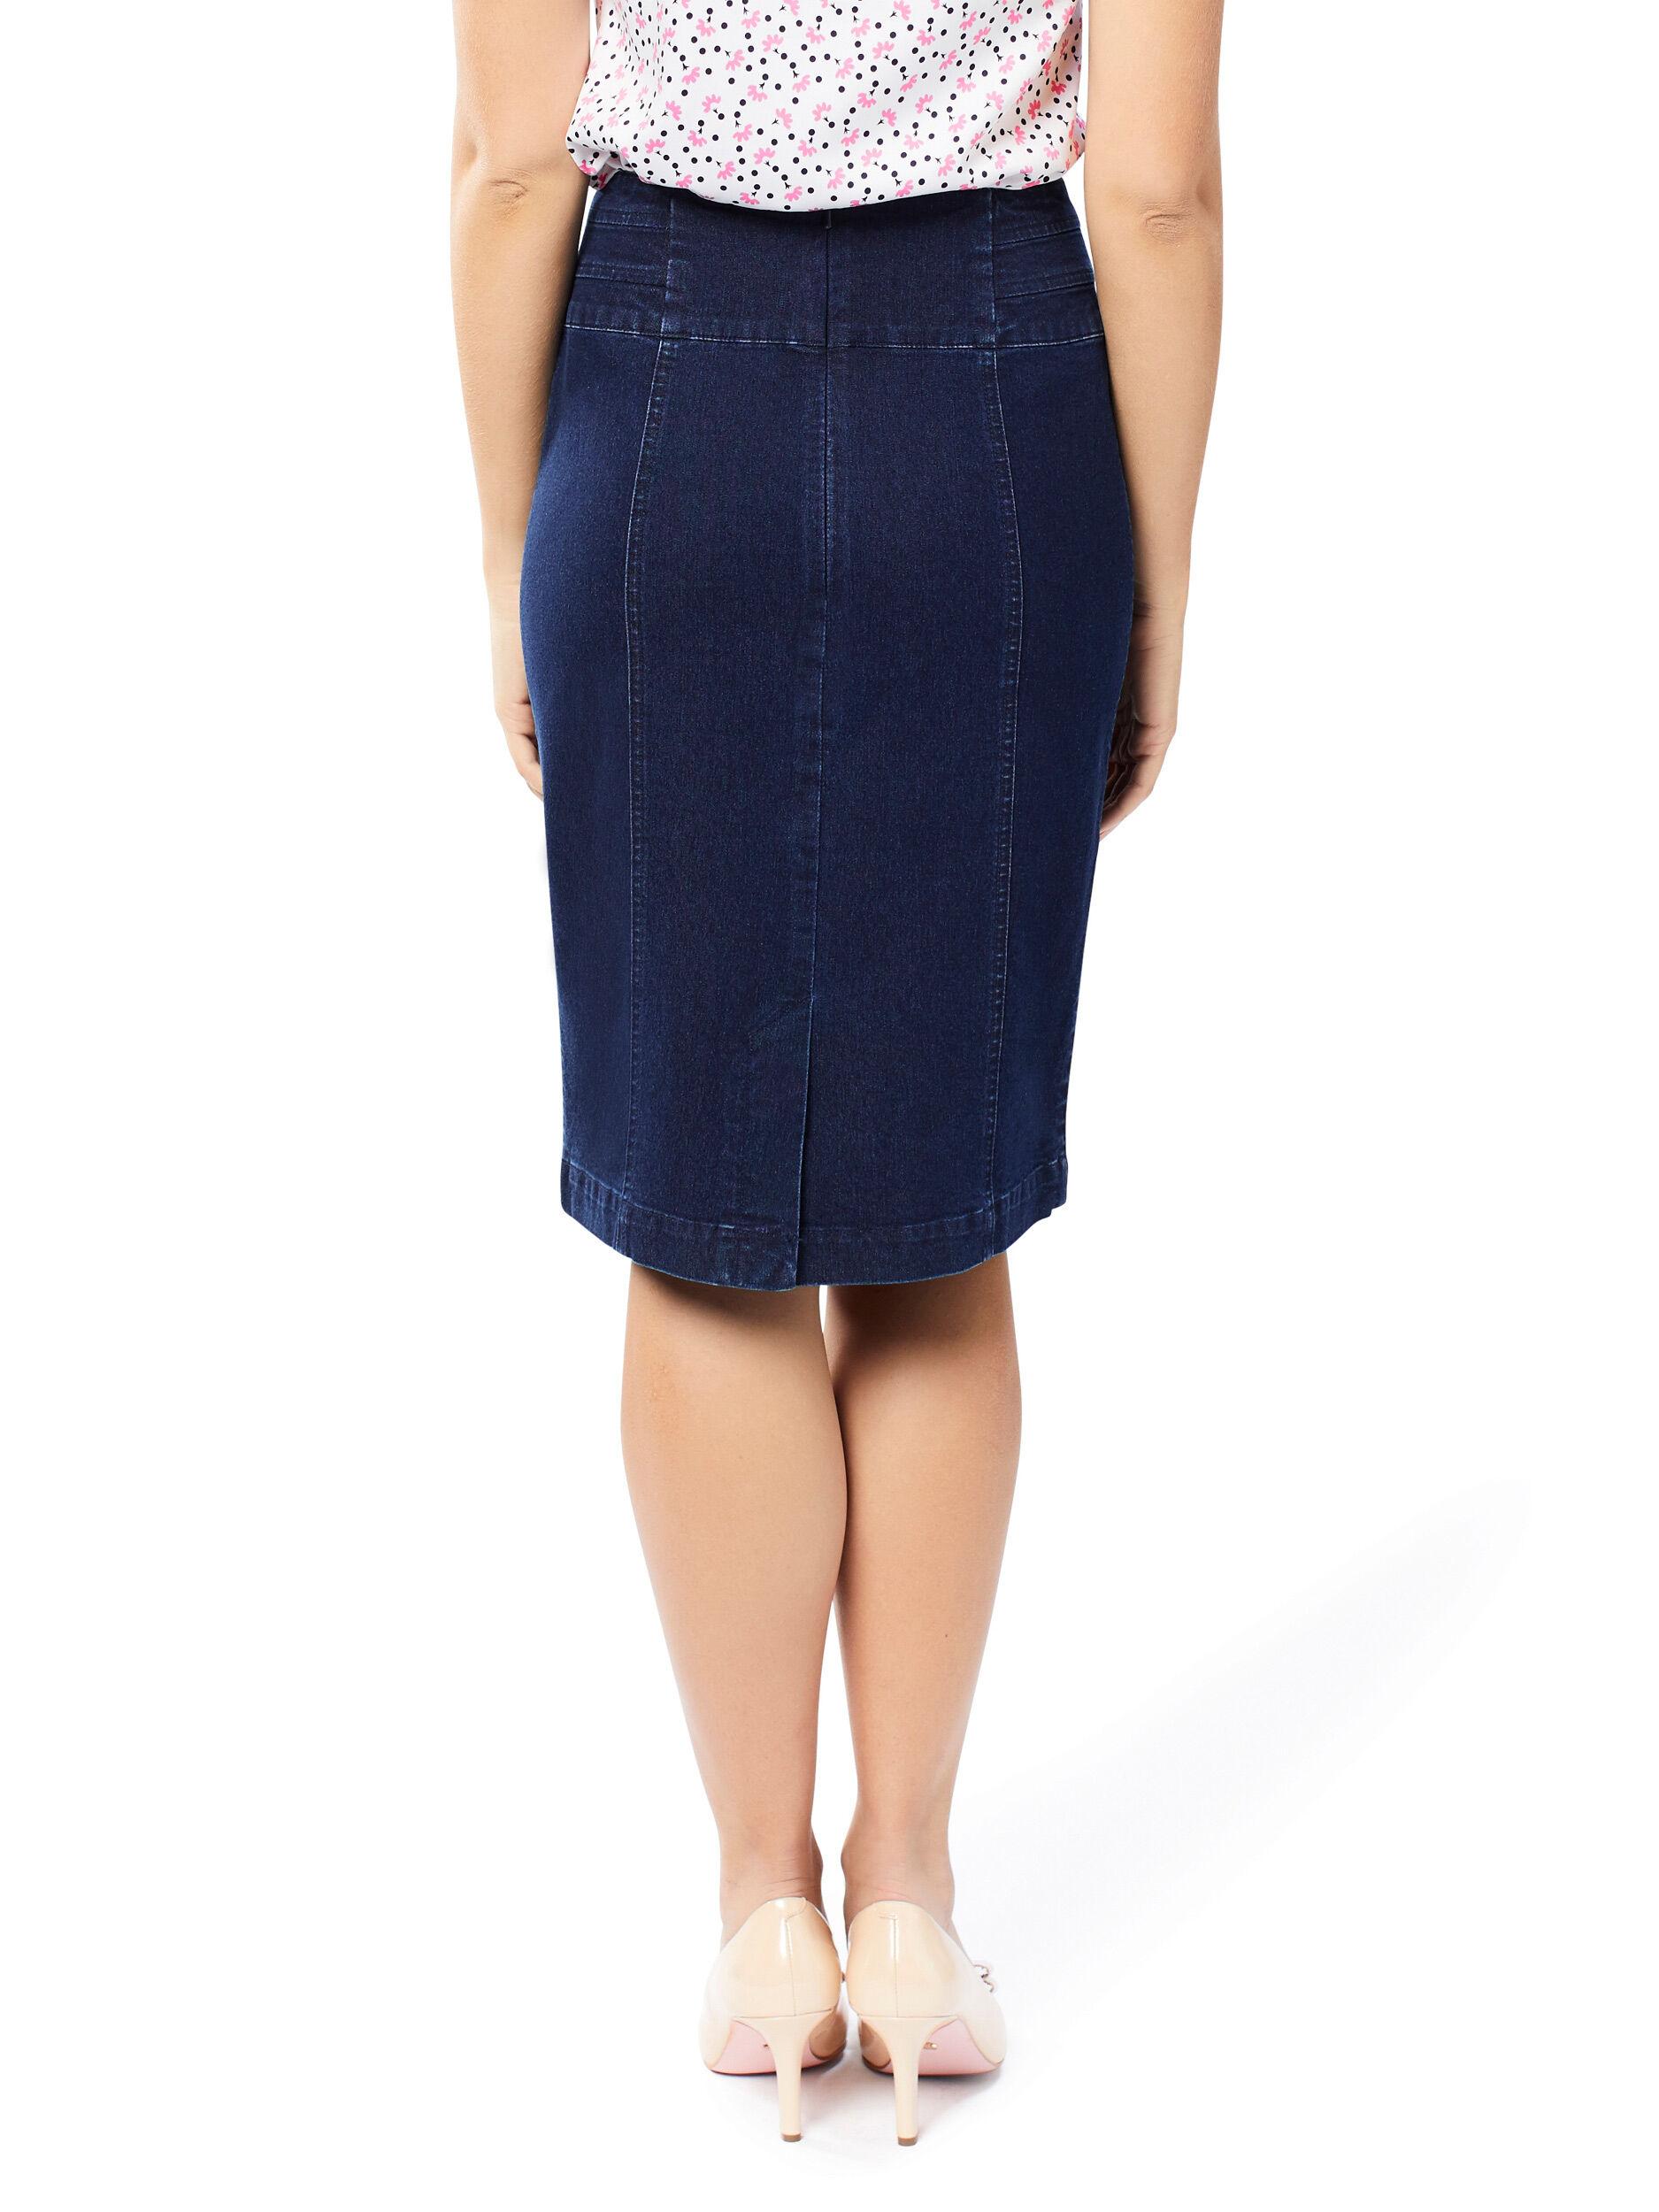 Sailor Skirt